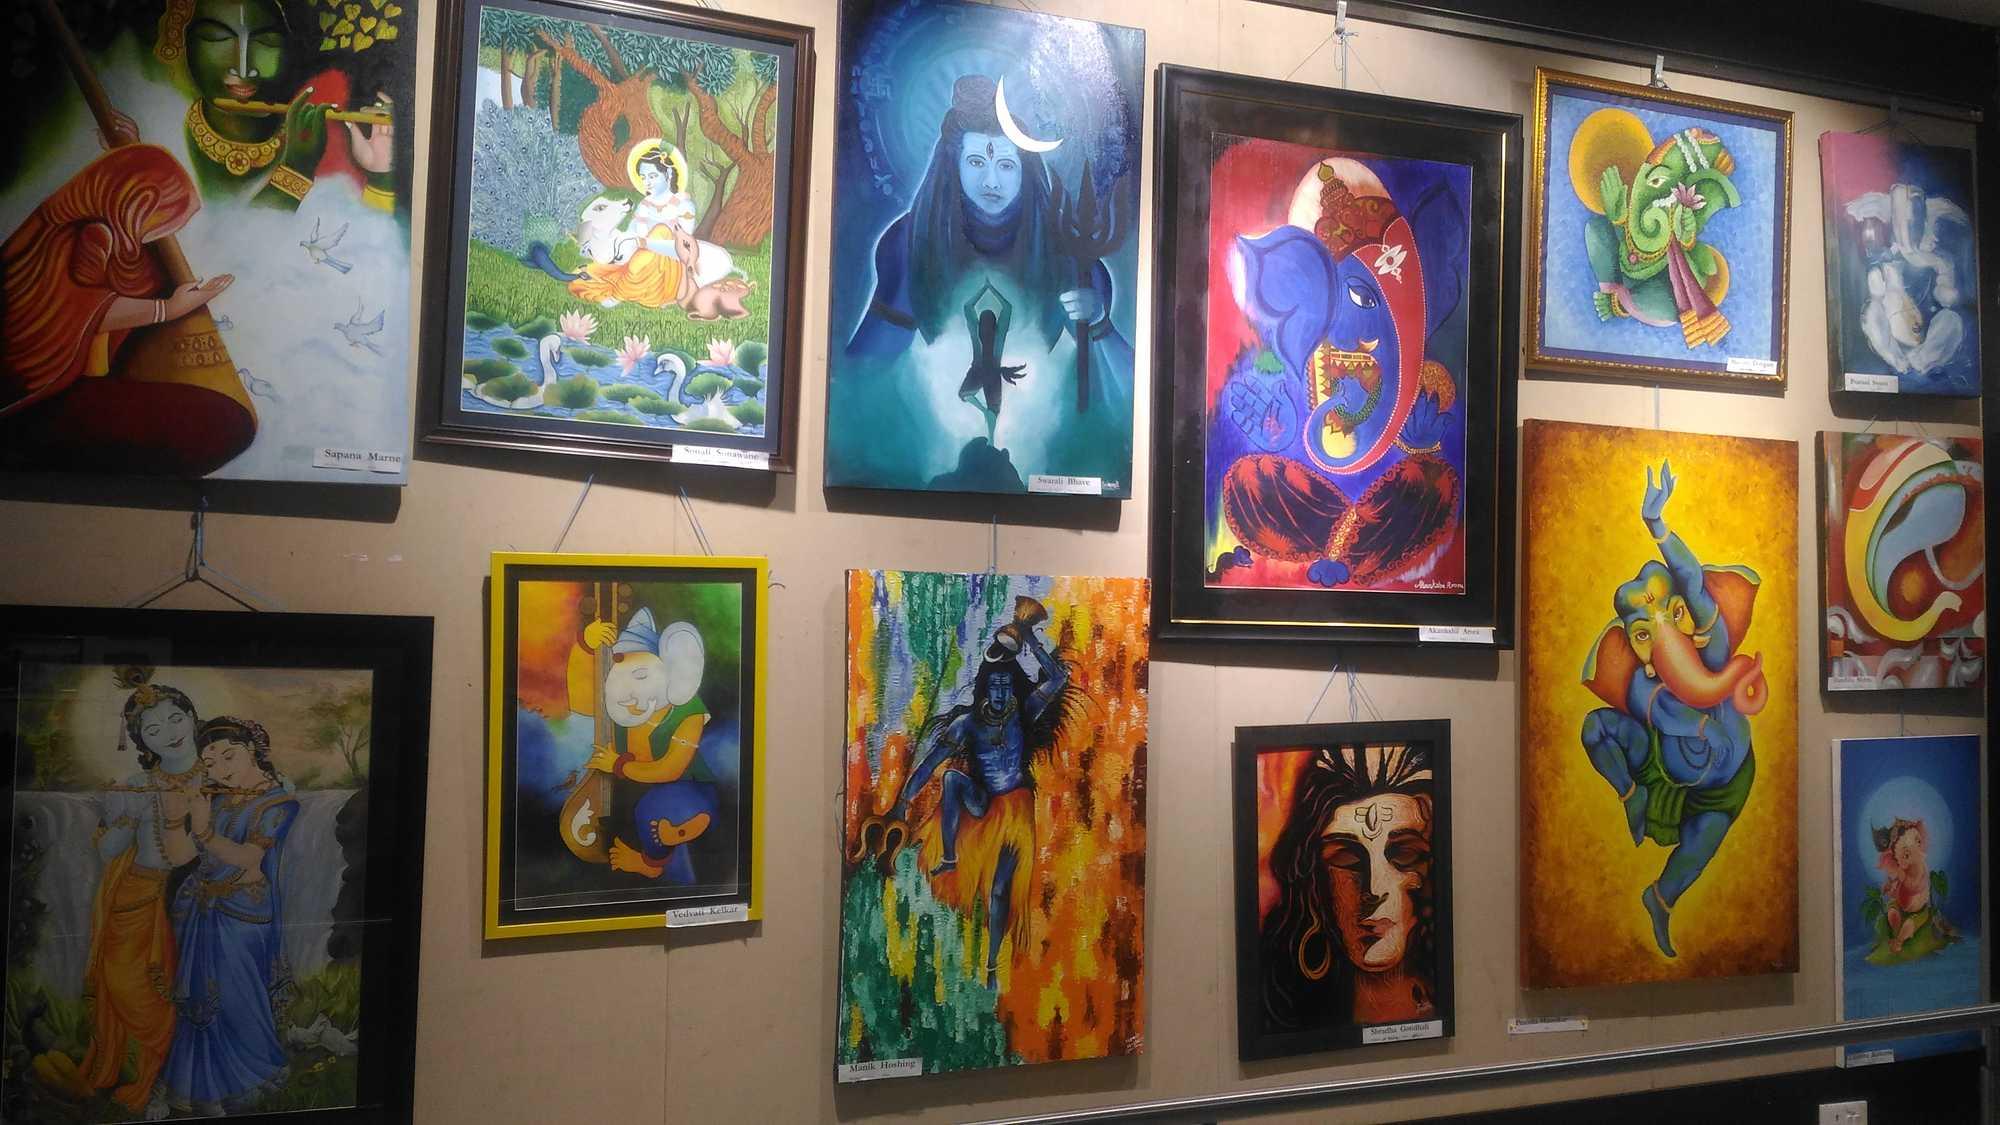 Top 30 Painting Classes in Chandan Nagar-Kharadi, Pune